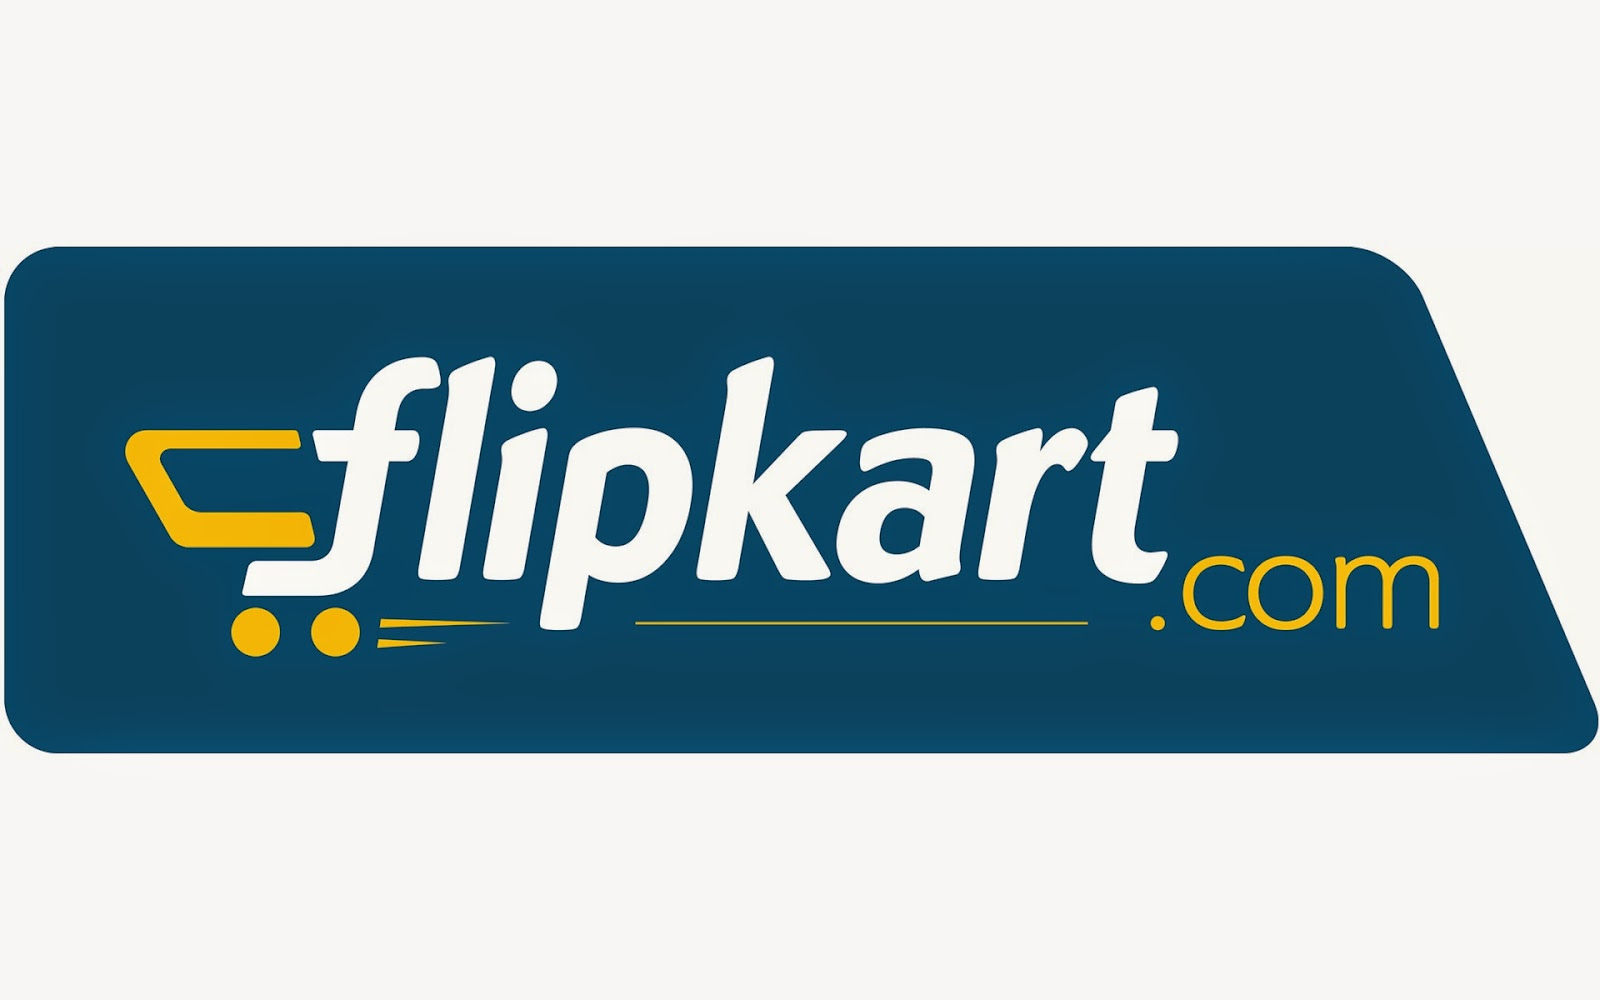 http://dl.flipkart.com/dl/cameras?affid=kheteshwa